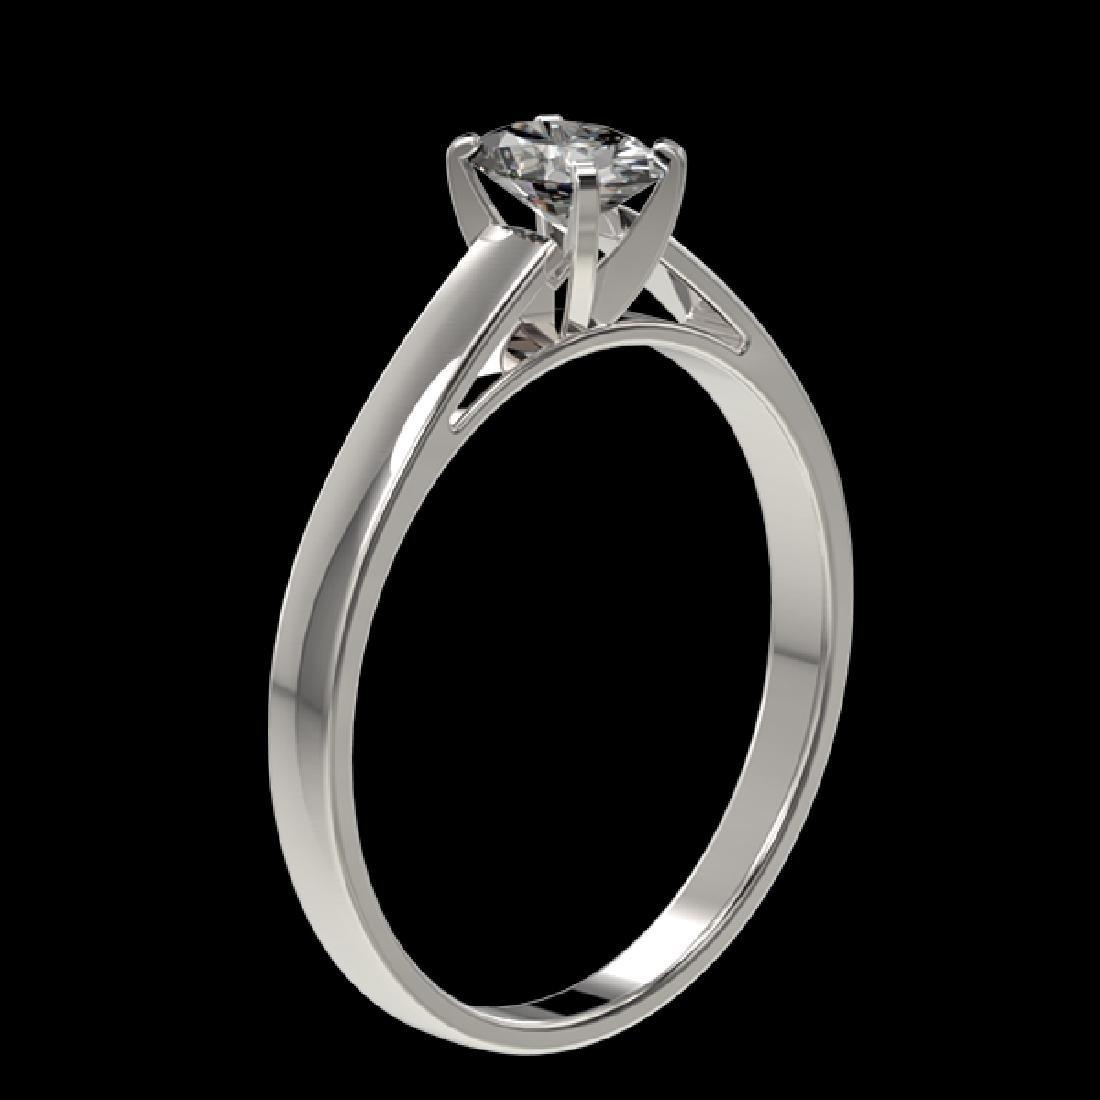 0.50 CTW Certified VS/SI Quality Oval Diamond - 3